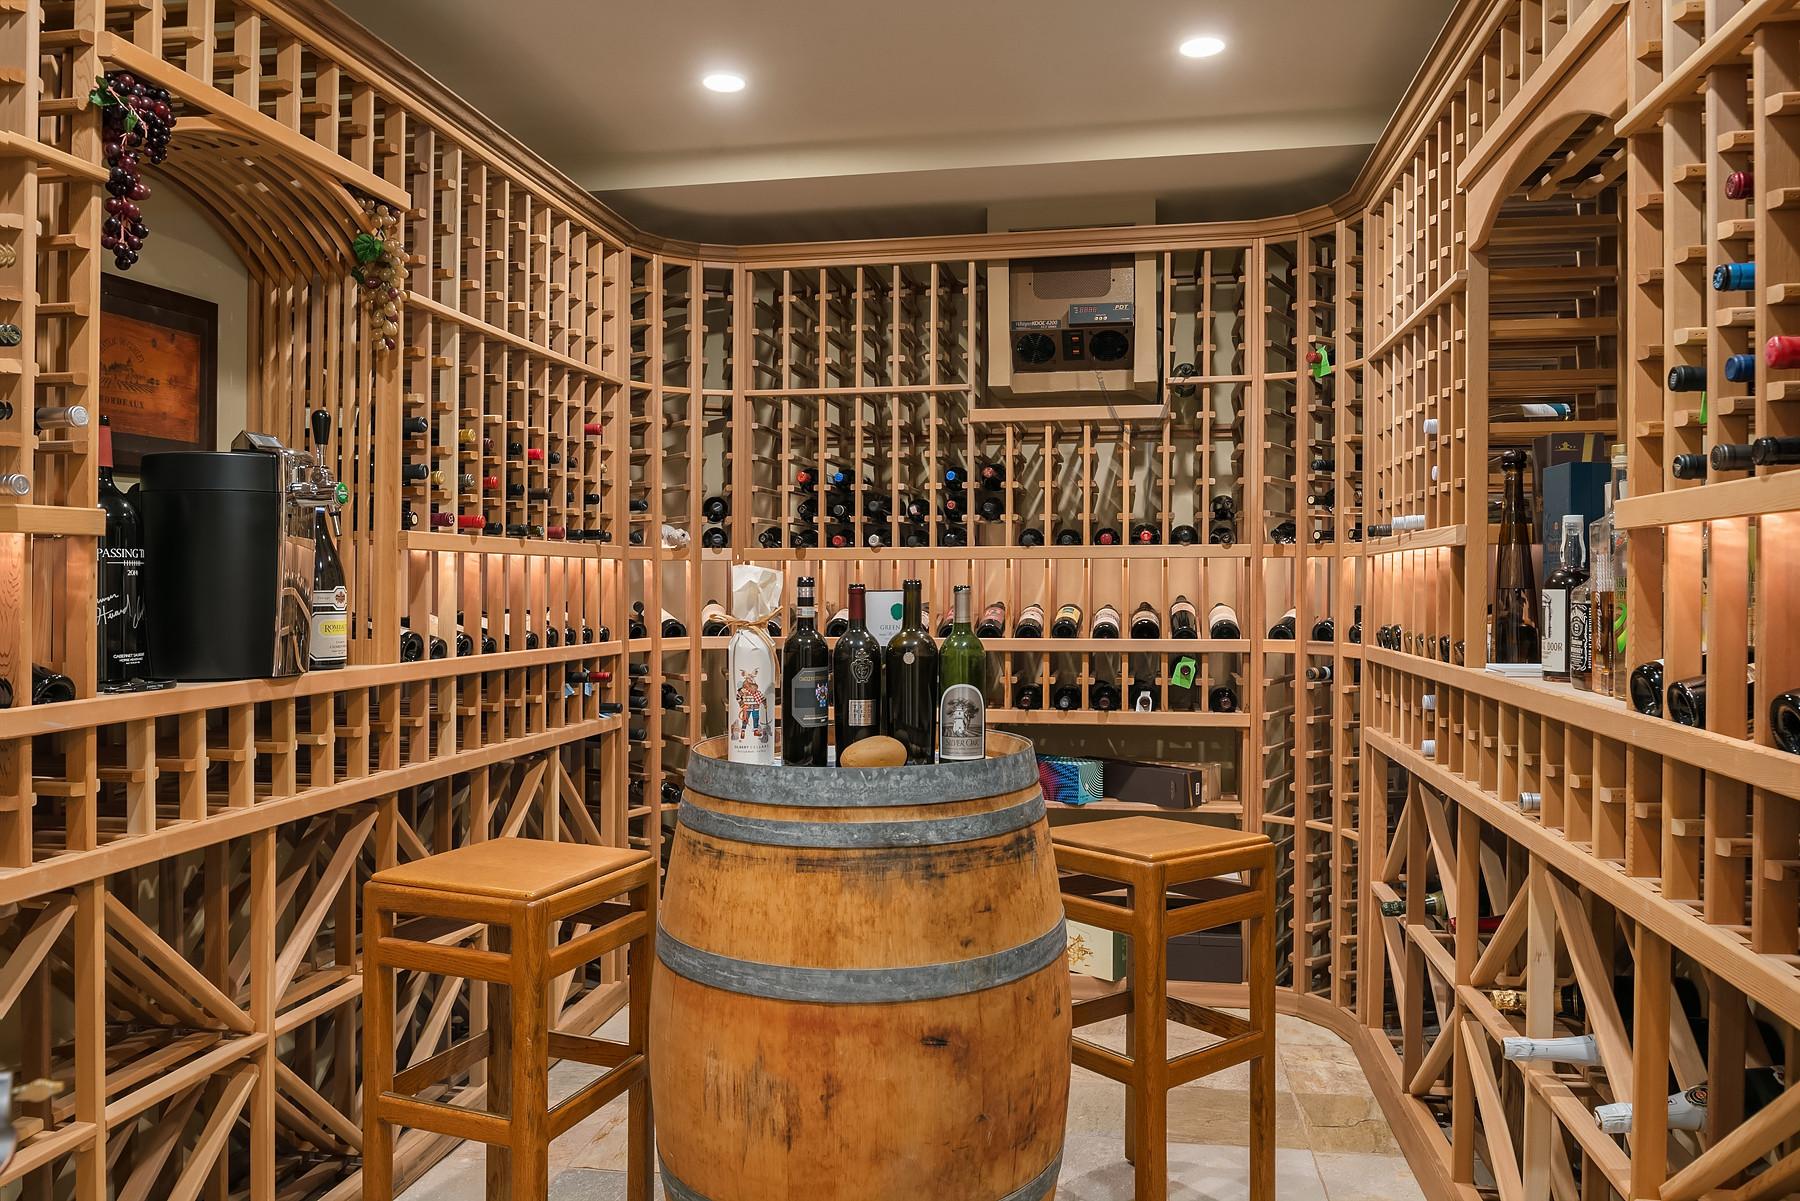 Conditioned wine room